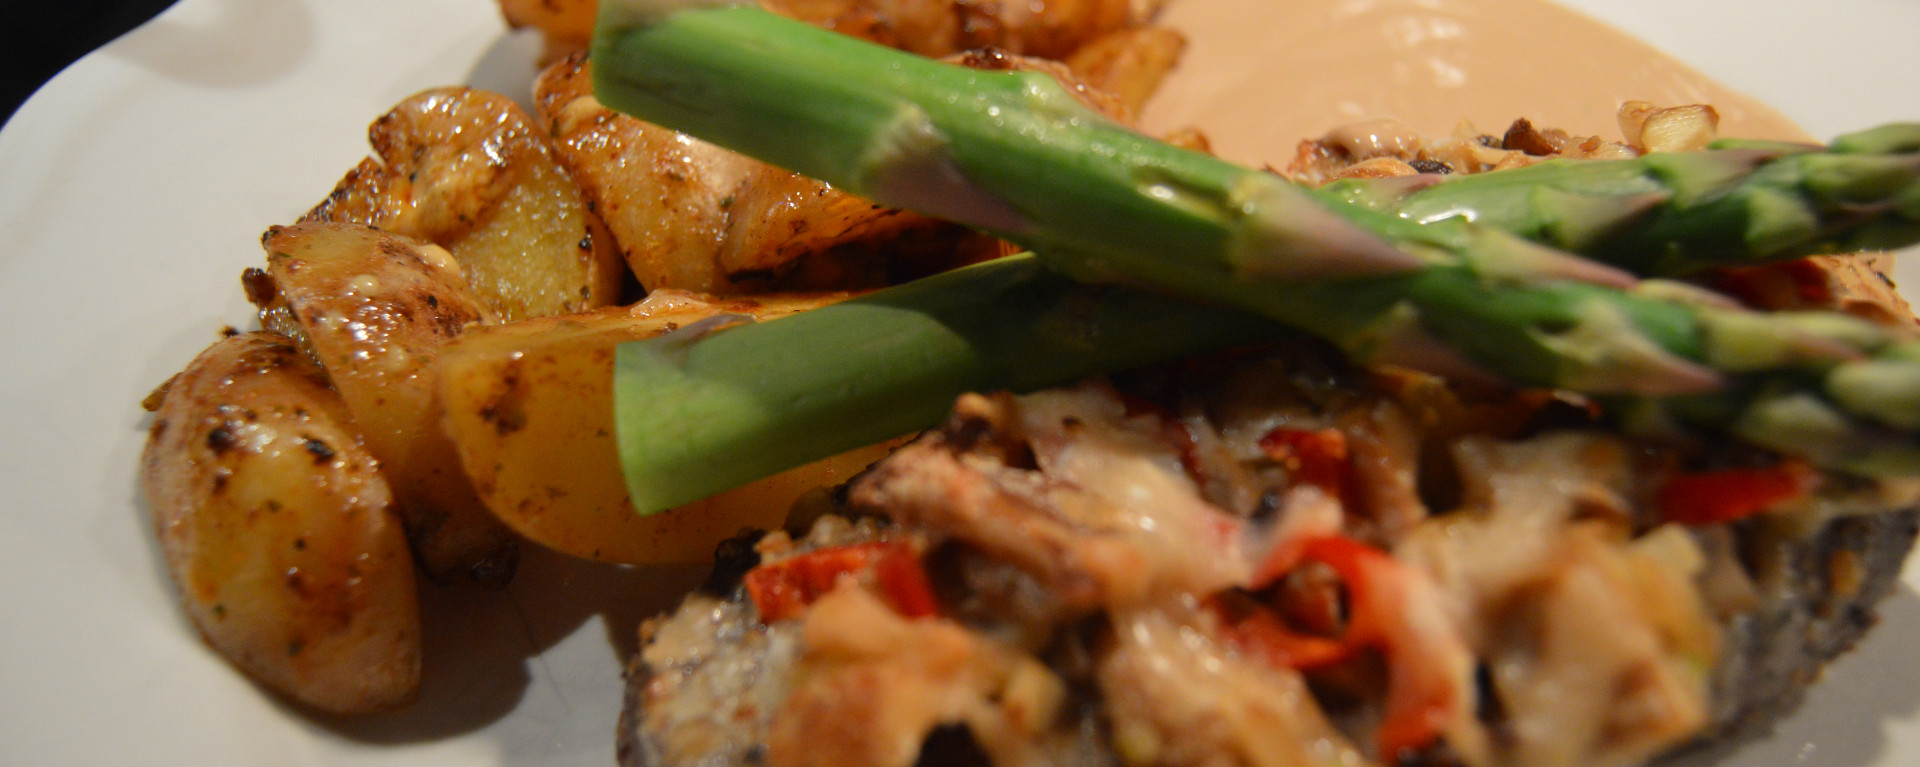 ChefNorway's Steak With Mushroom